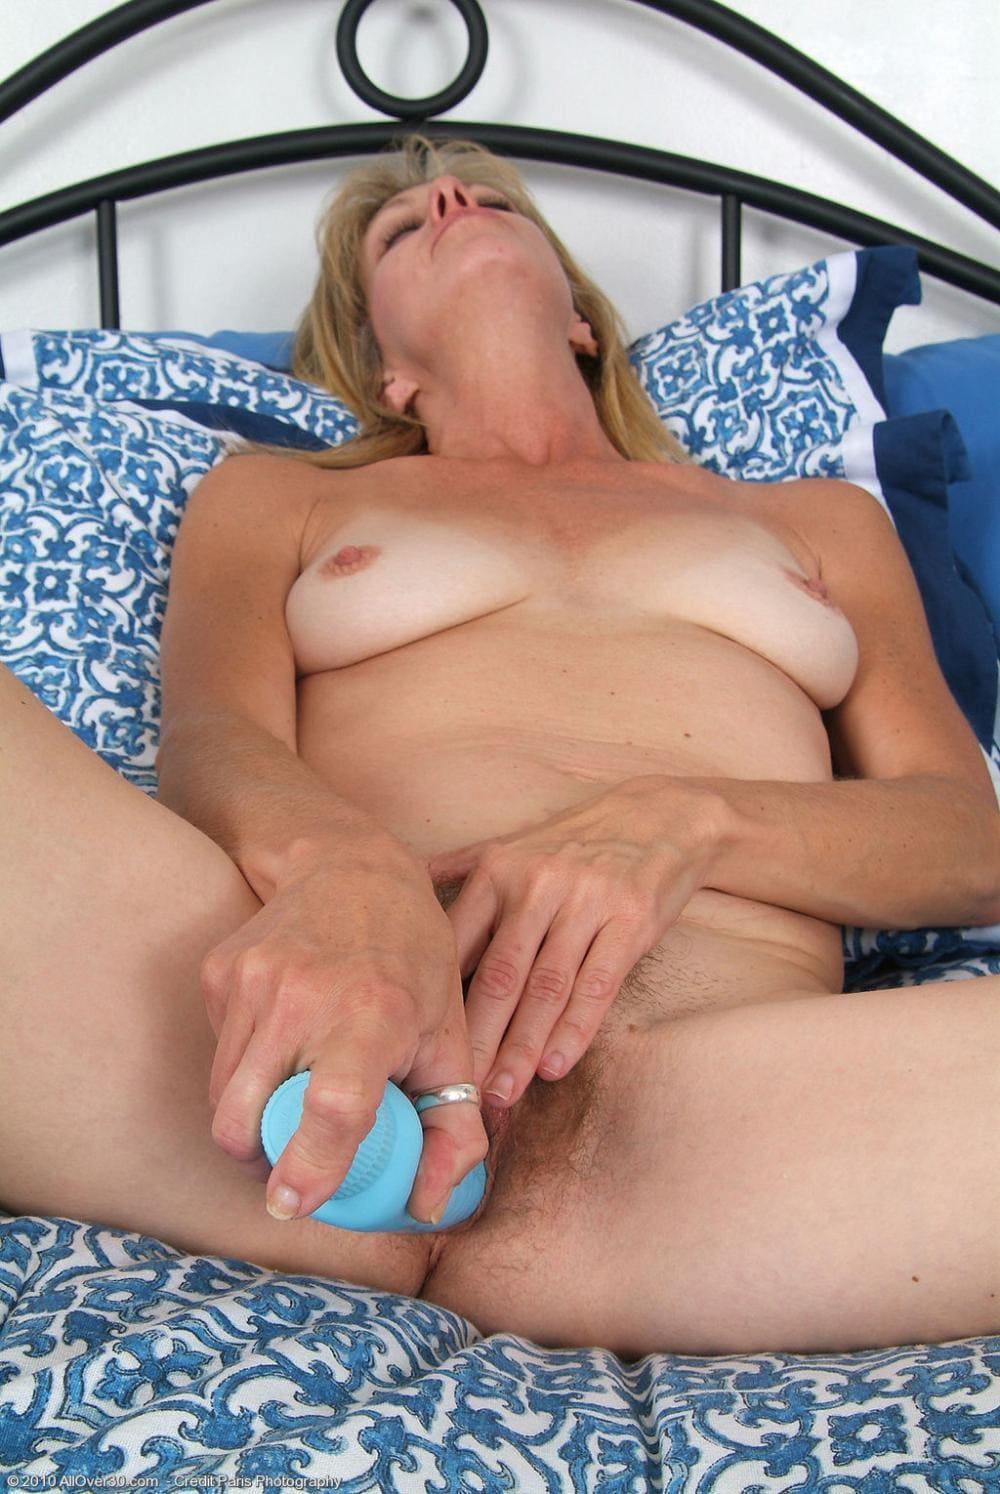 зрелые волосатые мастурбируют вибратором лежа на кровати раздвинув широко ноги